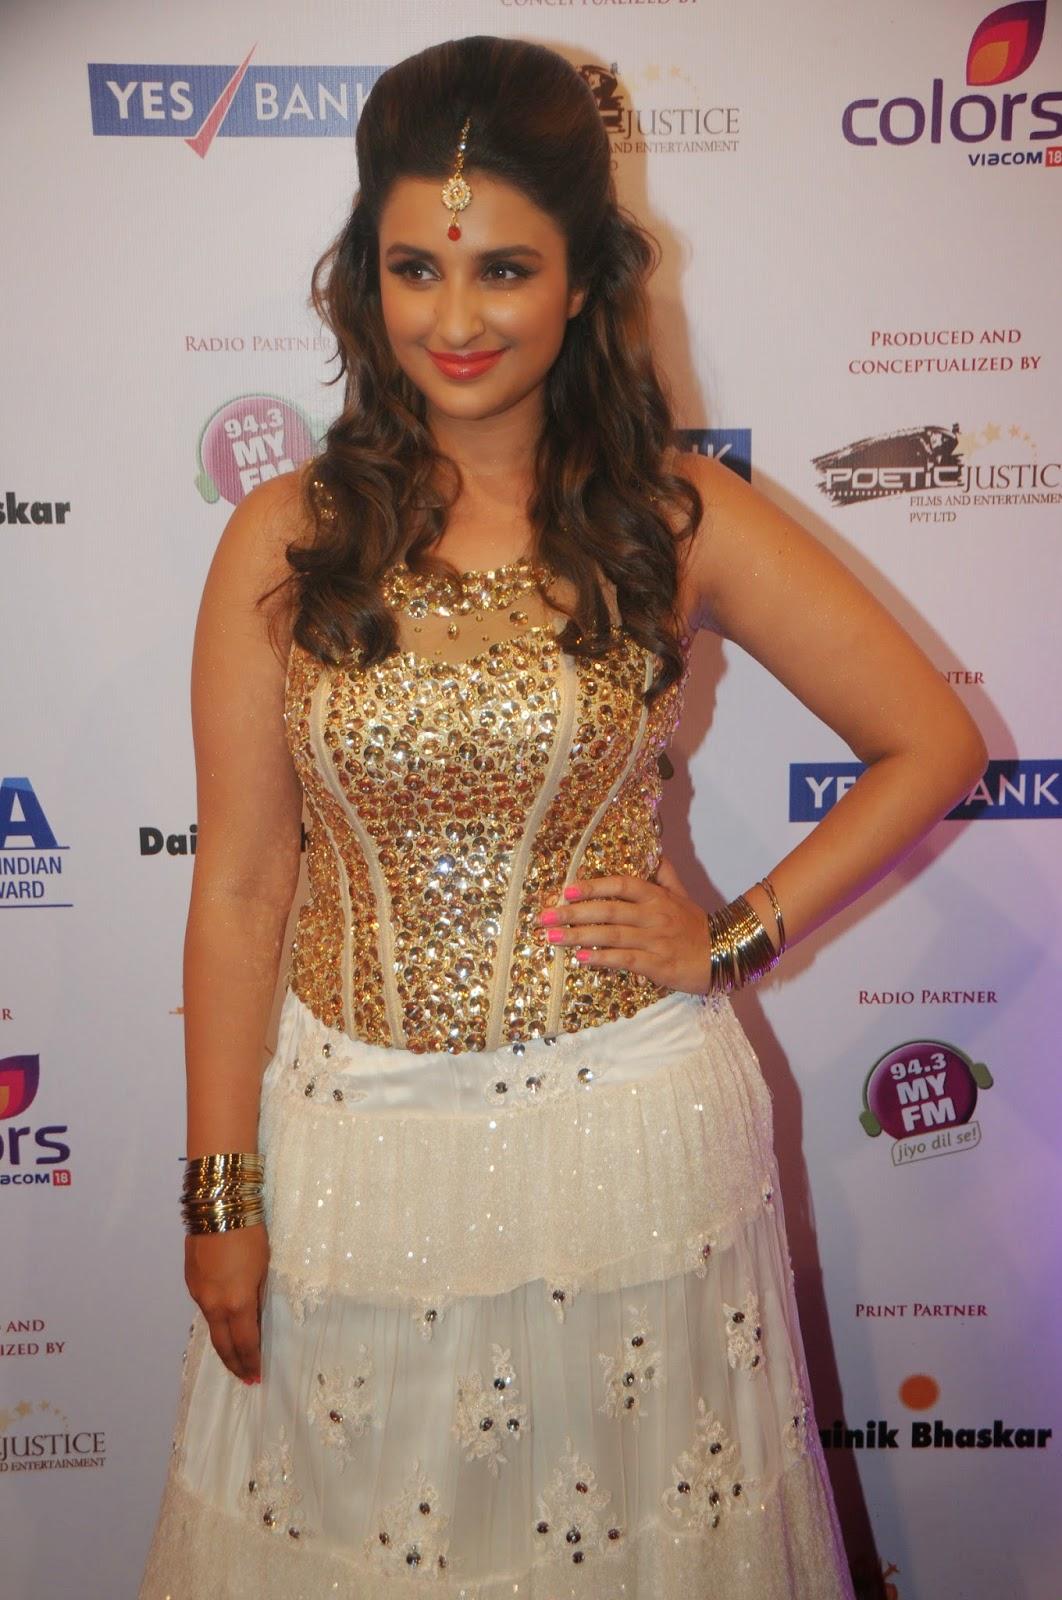 Parineeti Chopra, Alia Bhatt and Kiara Advani Looks Super Sexy At The India International Achievers Awards (IIAA)  In Filmcity, Mumbai ❤ ❤  ❤